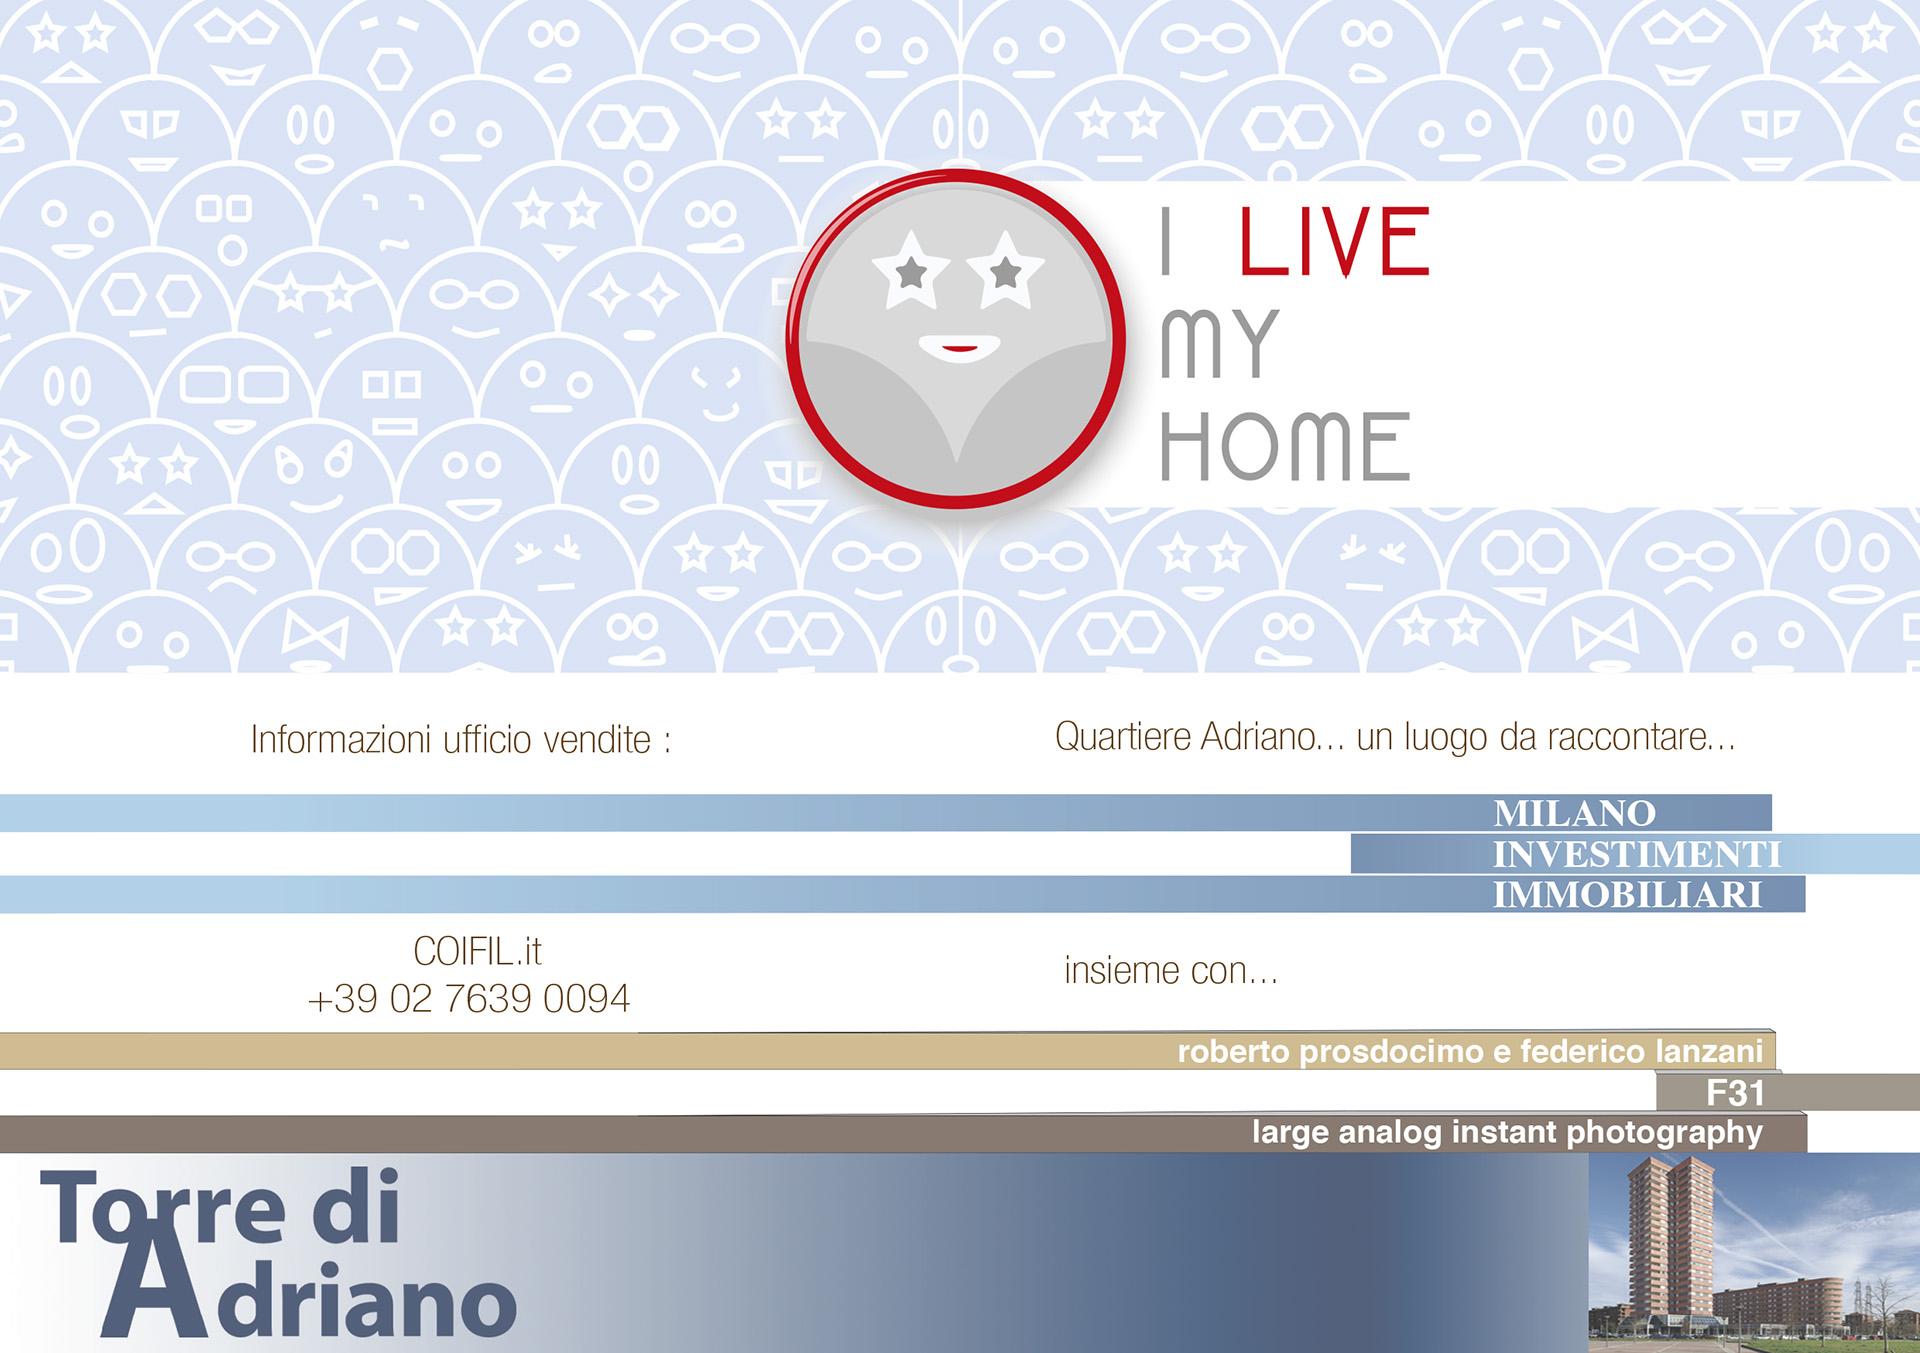 Folder_A5_MilanoInvestimenti_F31